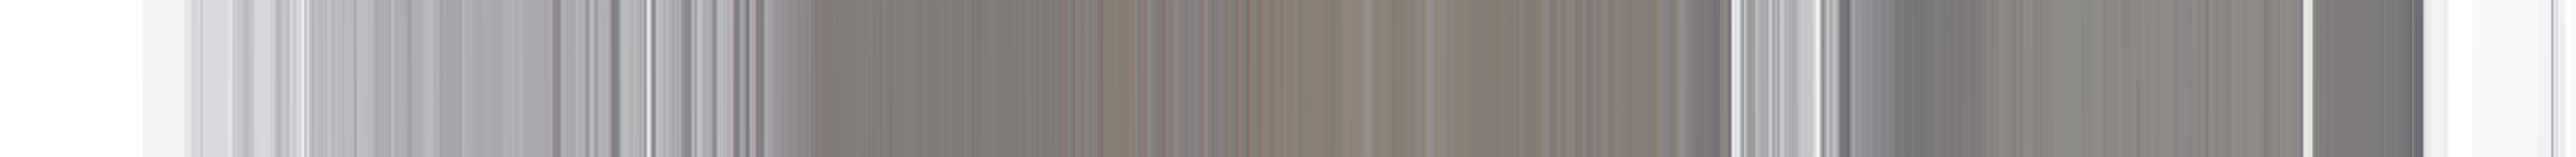 Solar textures system scope. Saturn clipart saturn ring